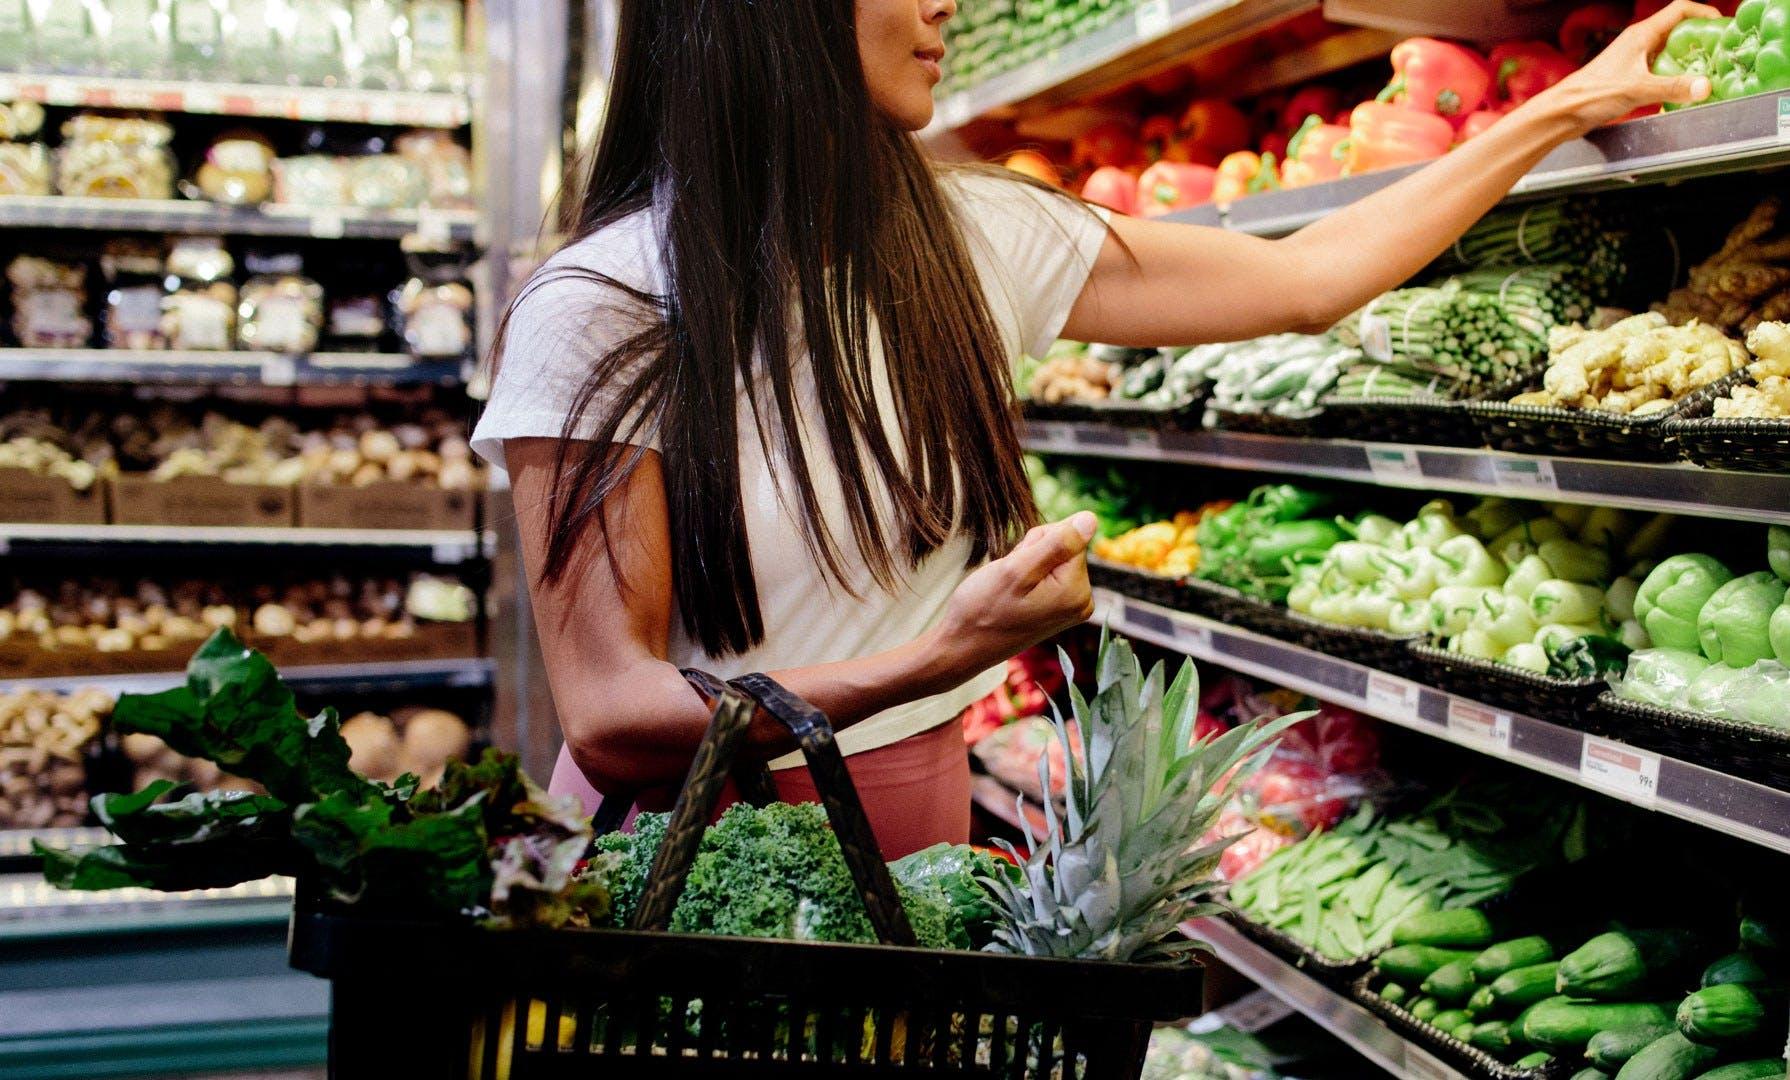 Woman grocery basket produce